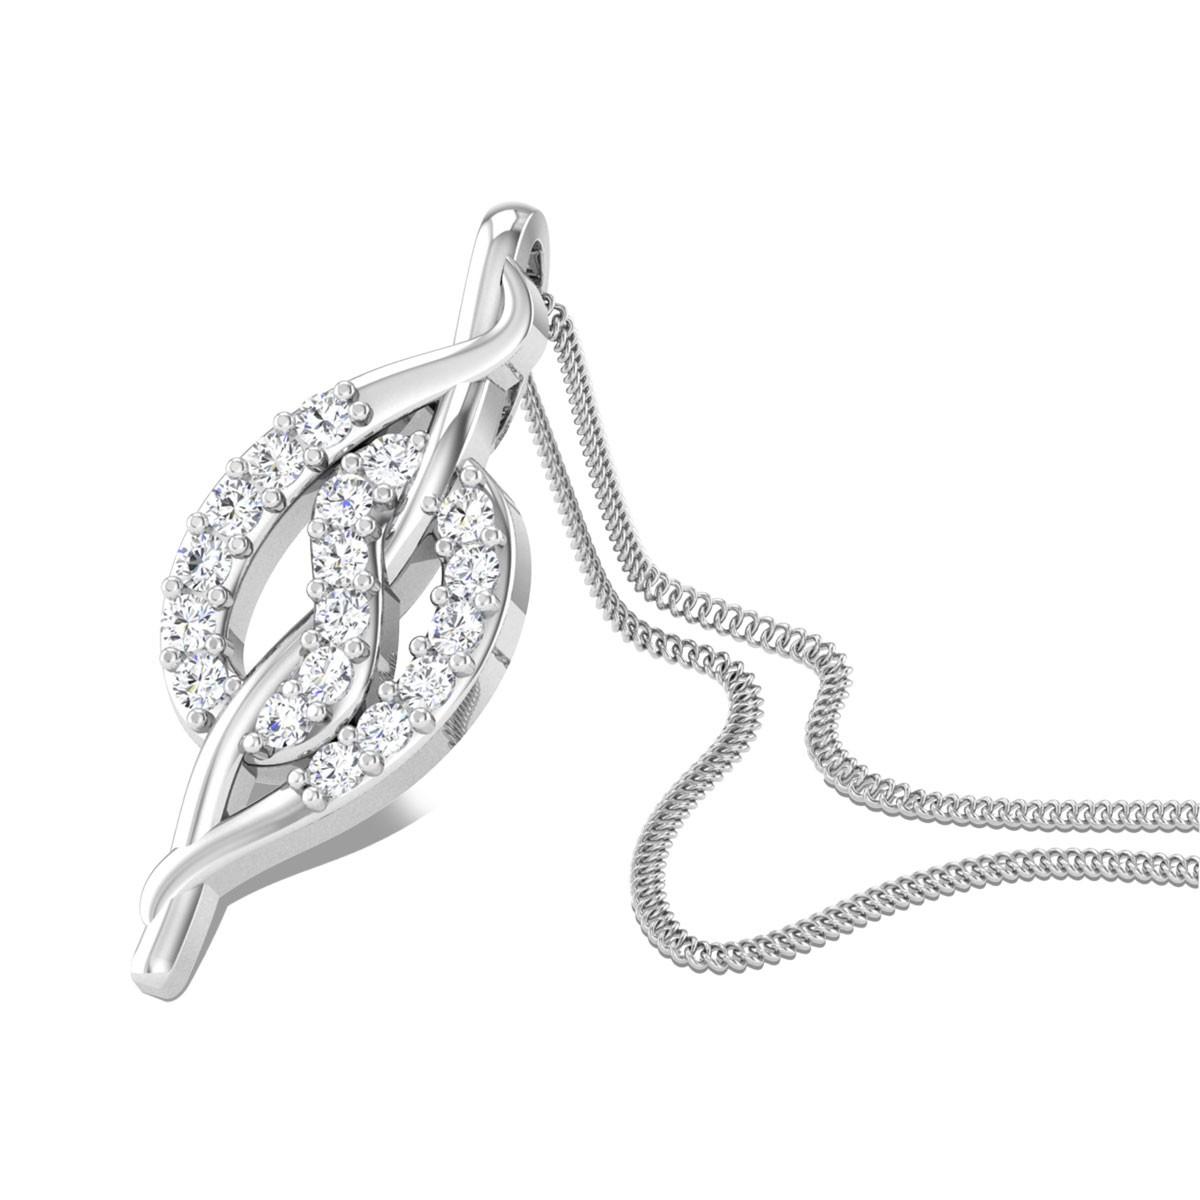 Coy Cuddle Diamond Pendant